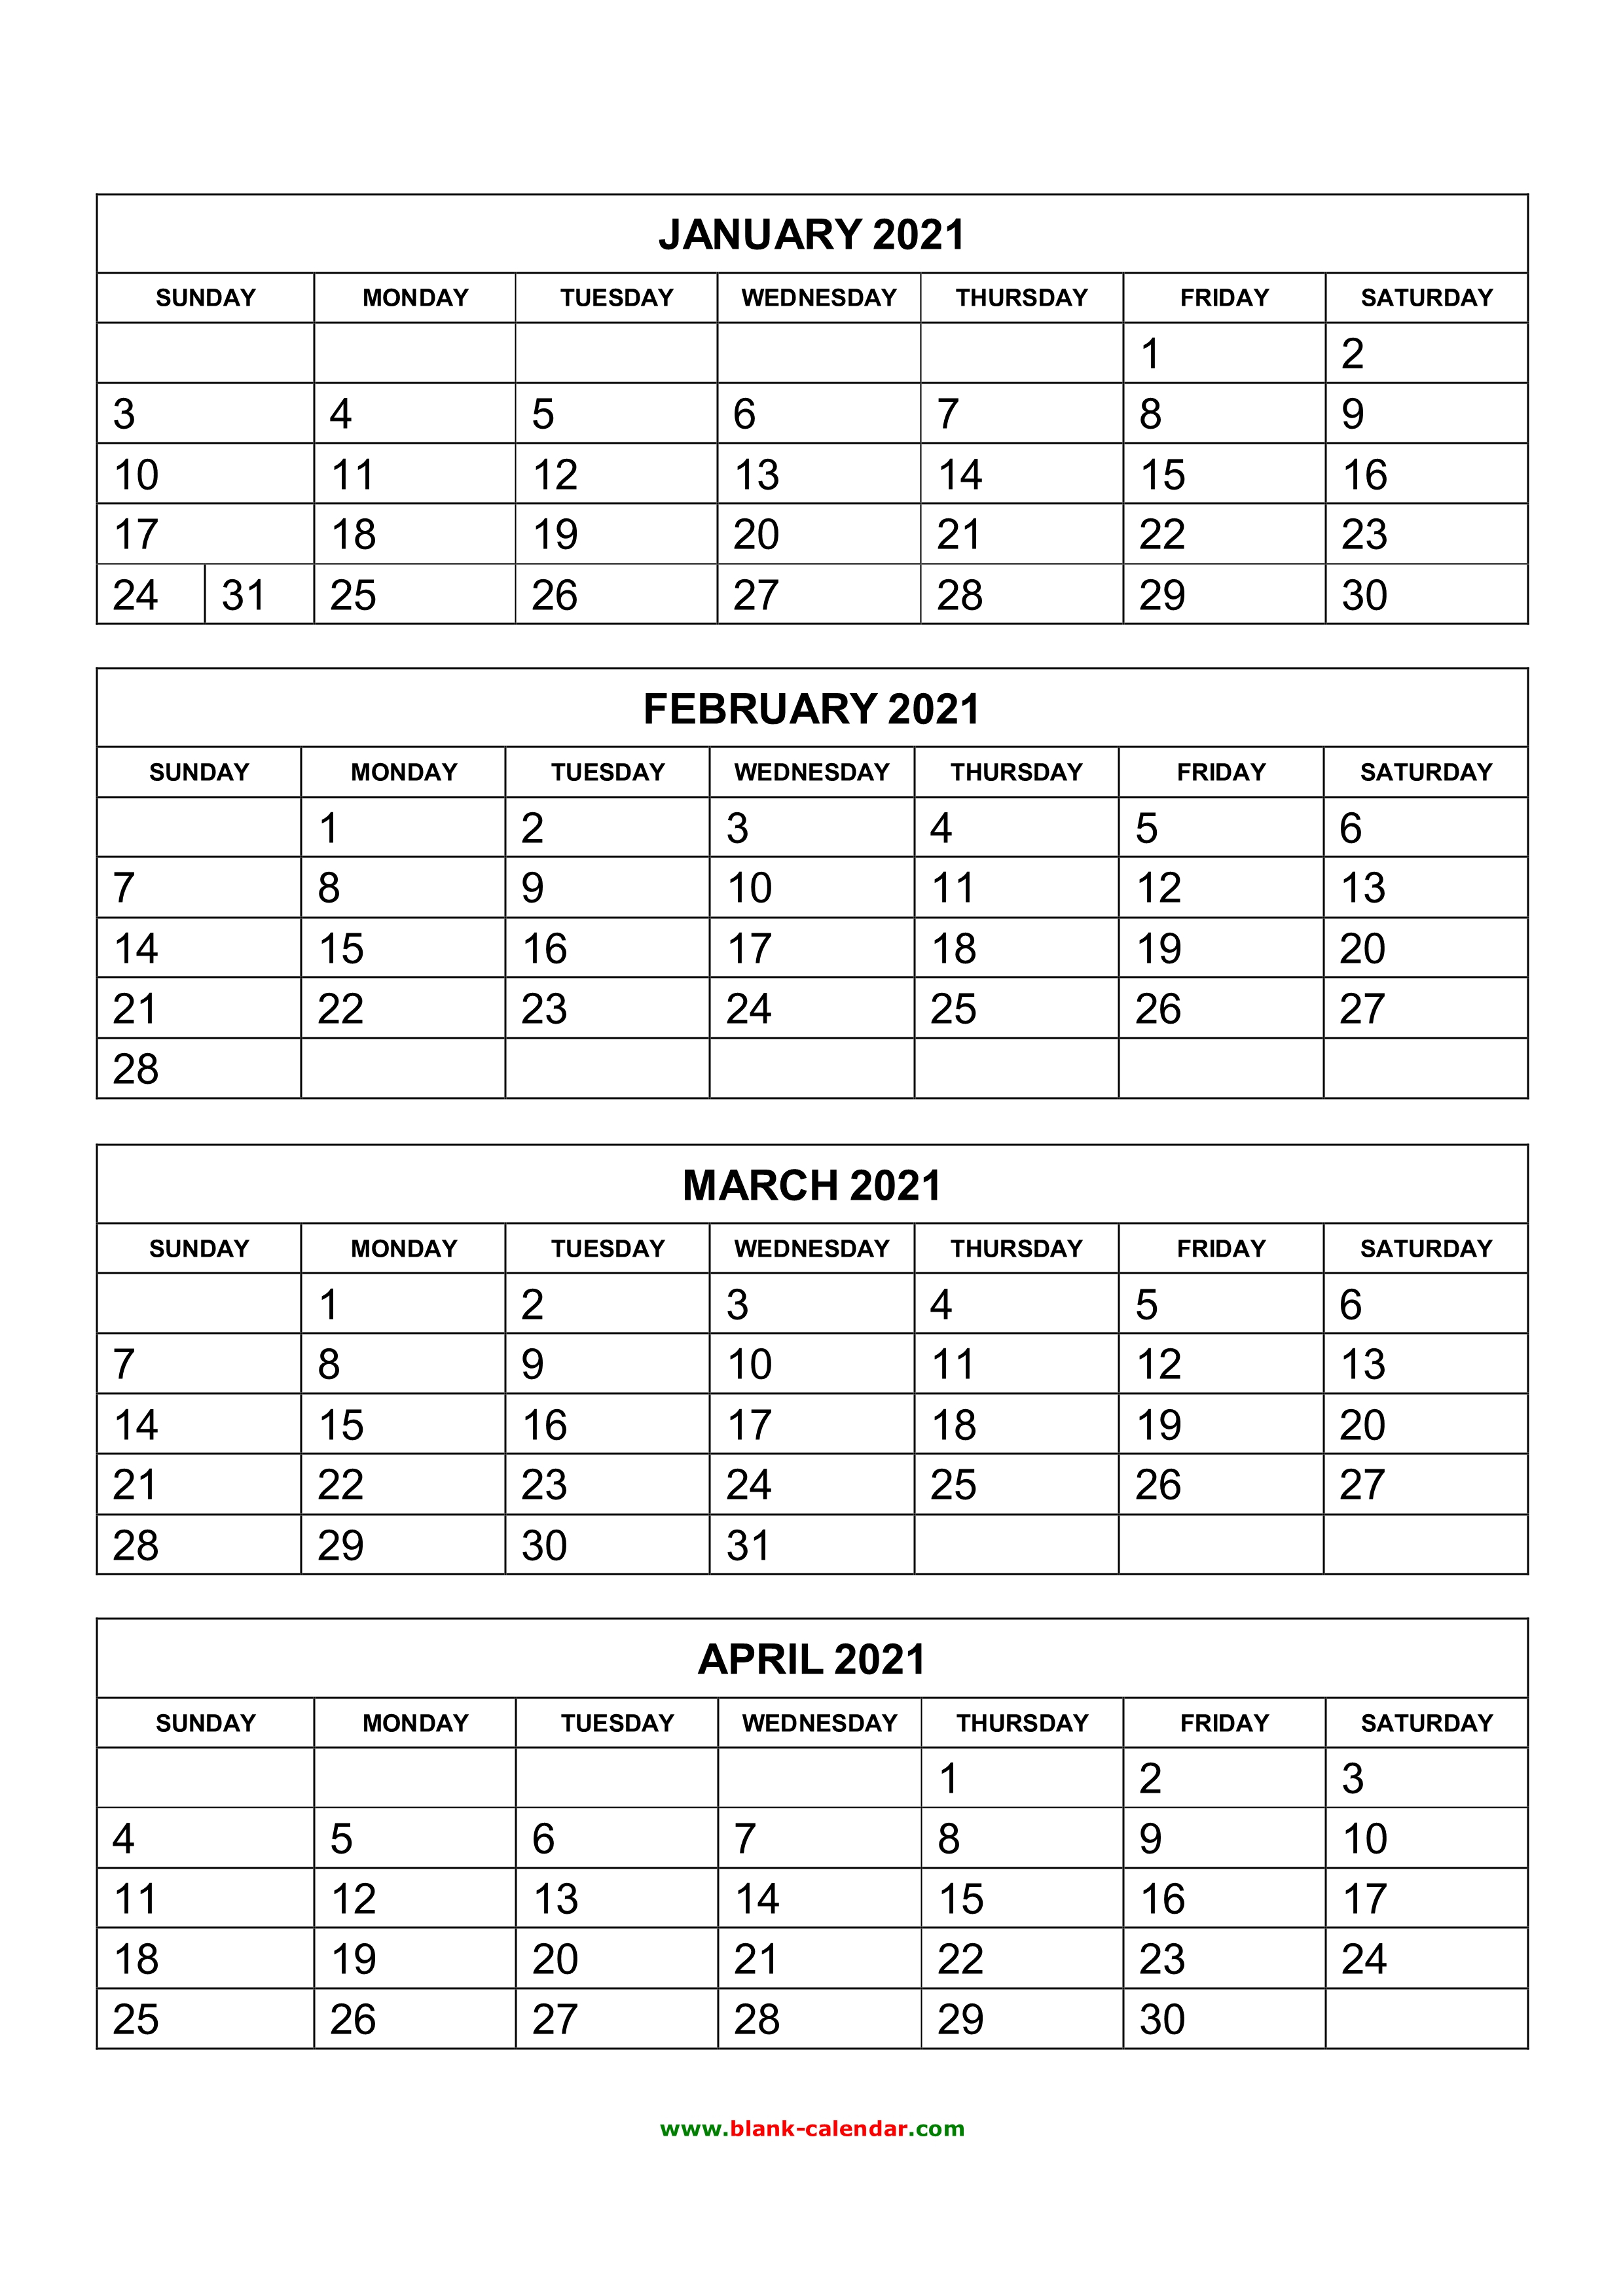 Free Download Printable Calendar 2021, 4 Months Per Page, 3 intended for Printable Calendar 4 Months Per Page